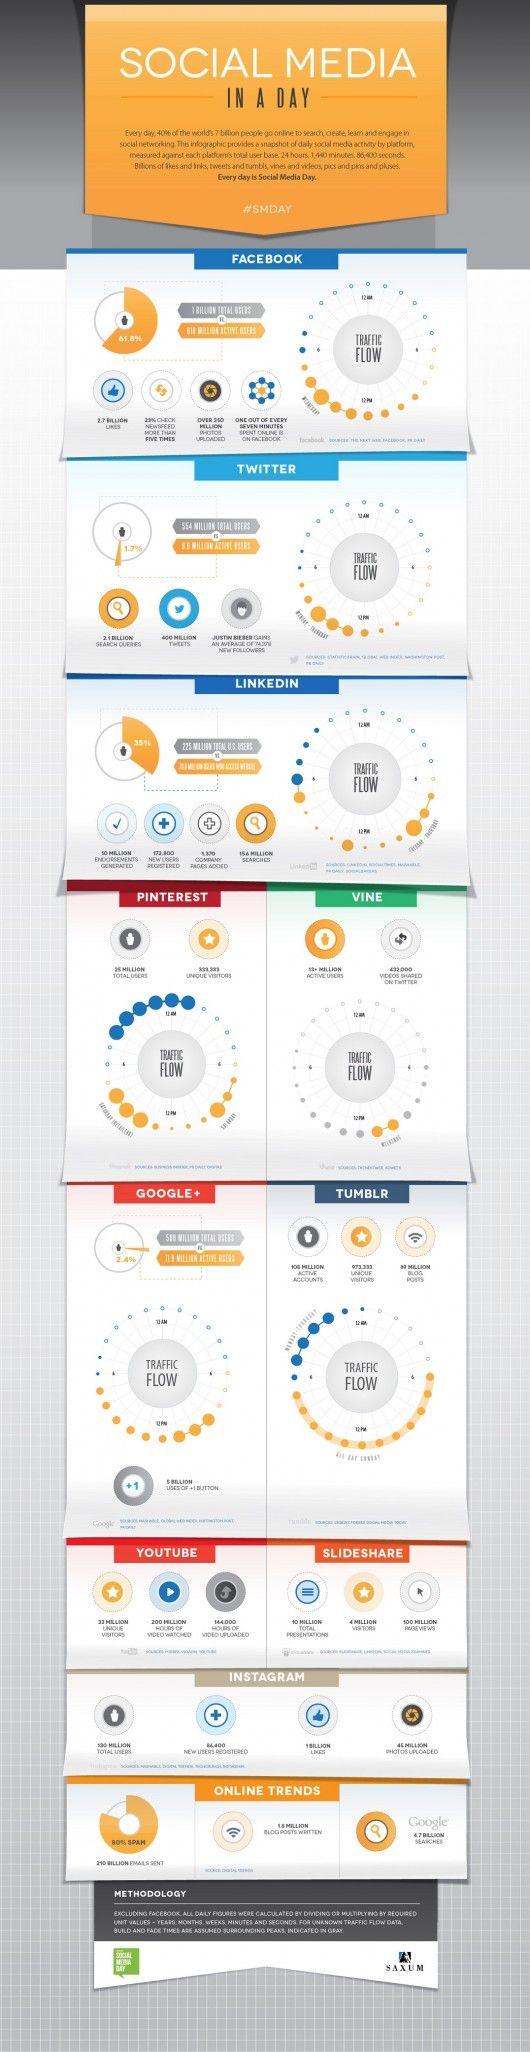 b2b-social-media-day-infographic